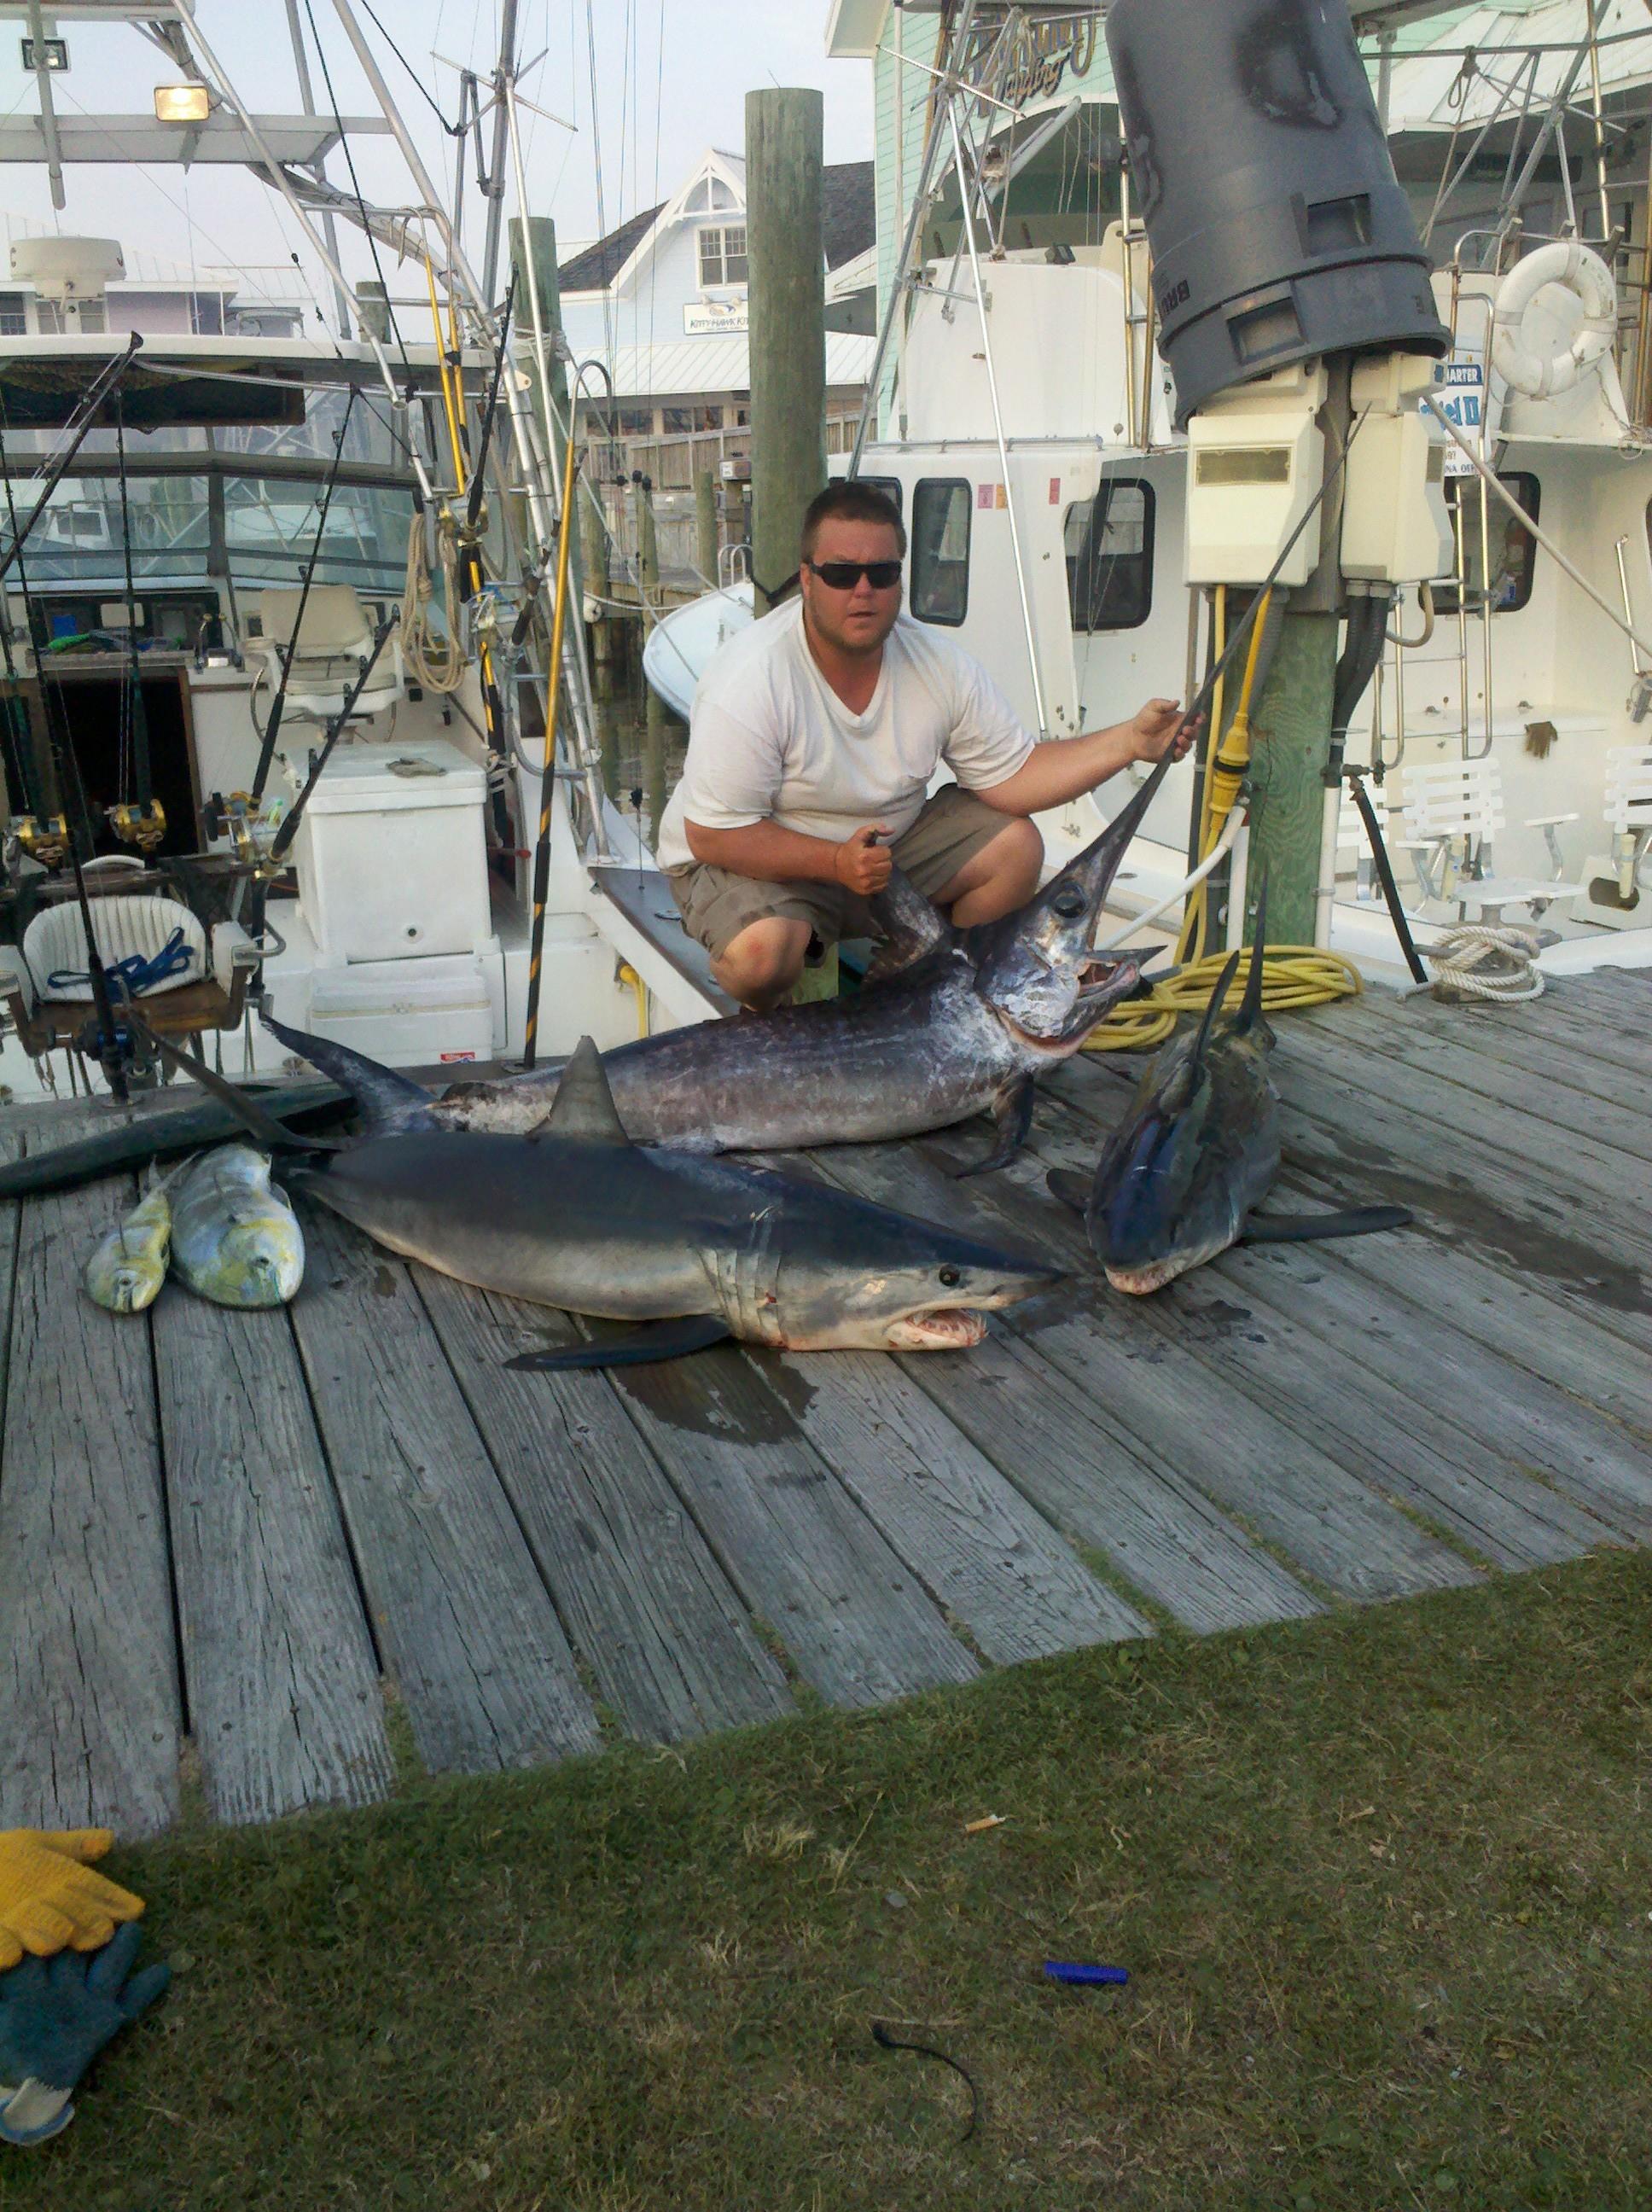 Foolish Pleasures Big Game Fishing: OC Shark Charters